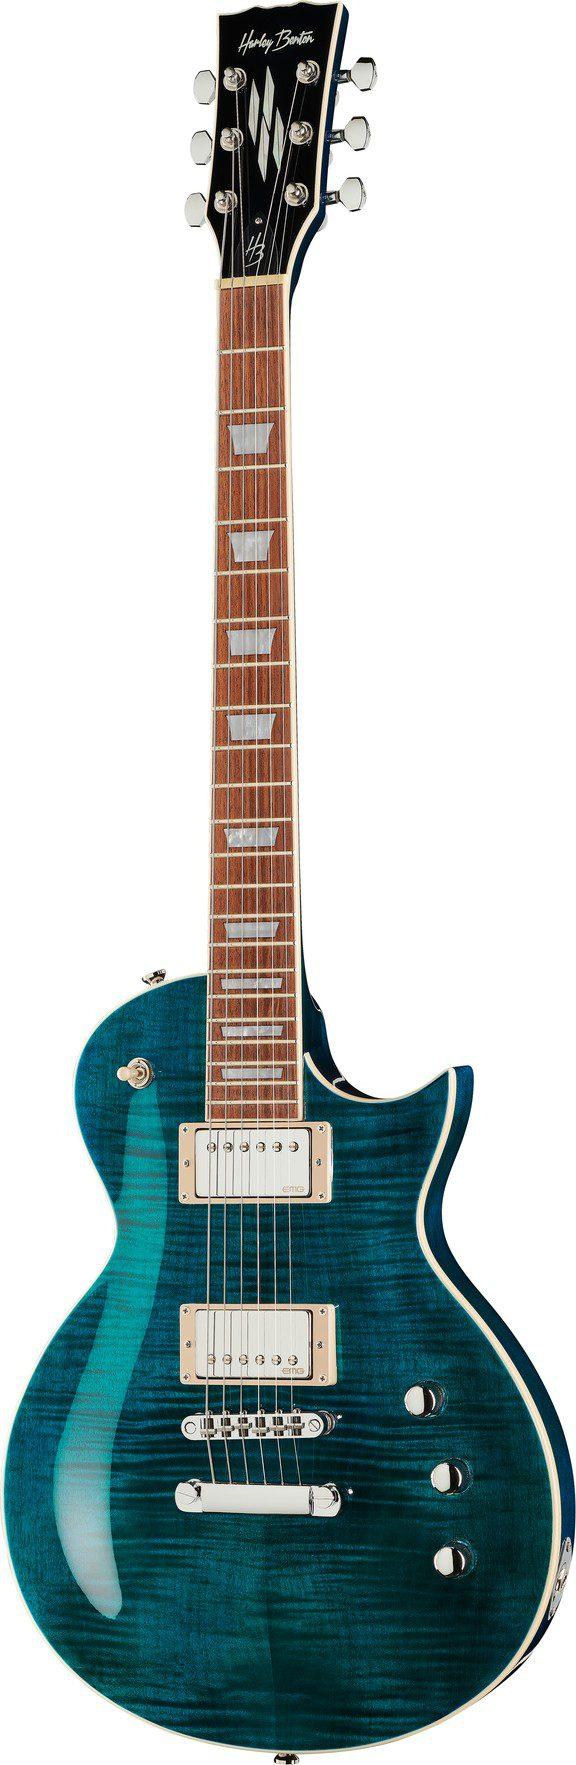 Harley Benton SC-Custom Plus 3